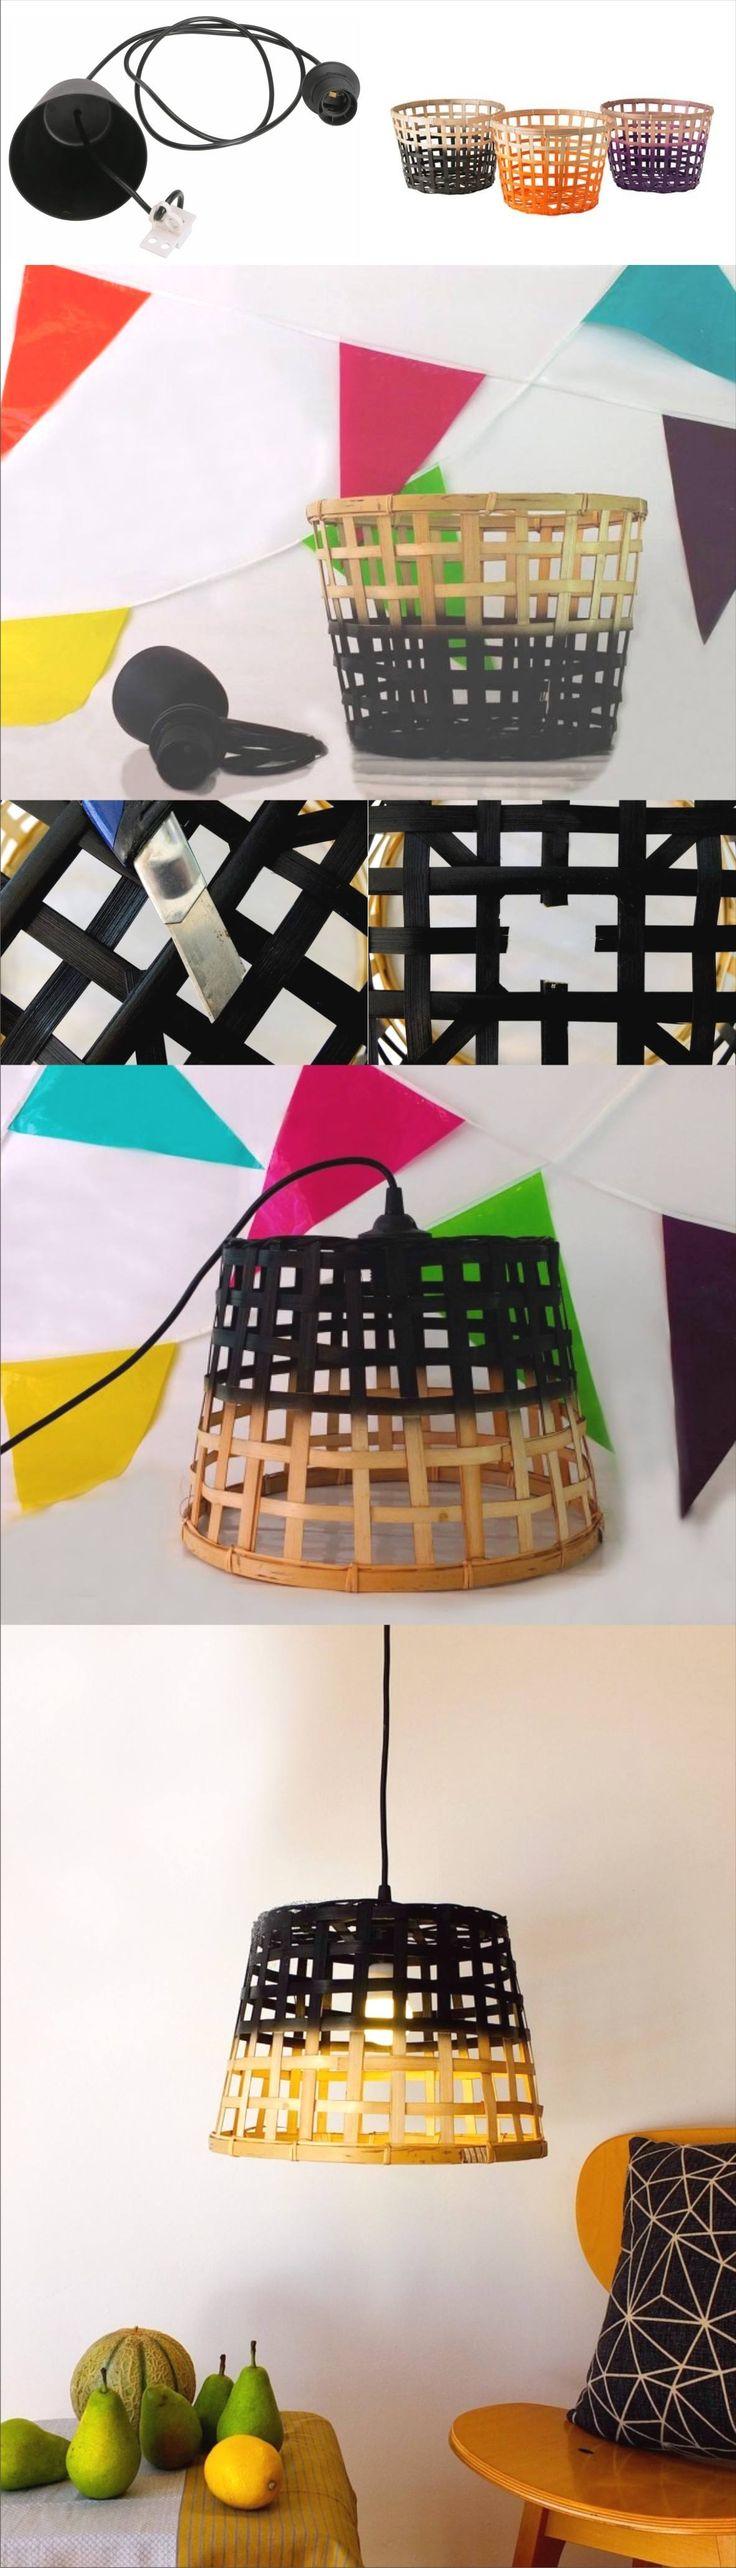 Lámpara Ikea Hack - befrenchie.fr - DIY Ikea Hack Lamp